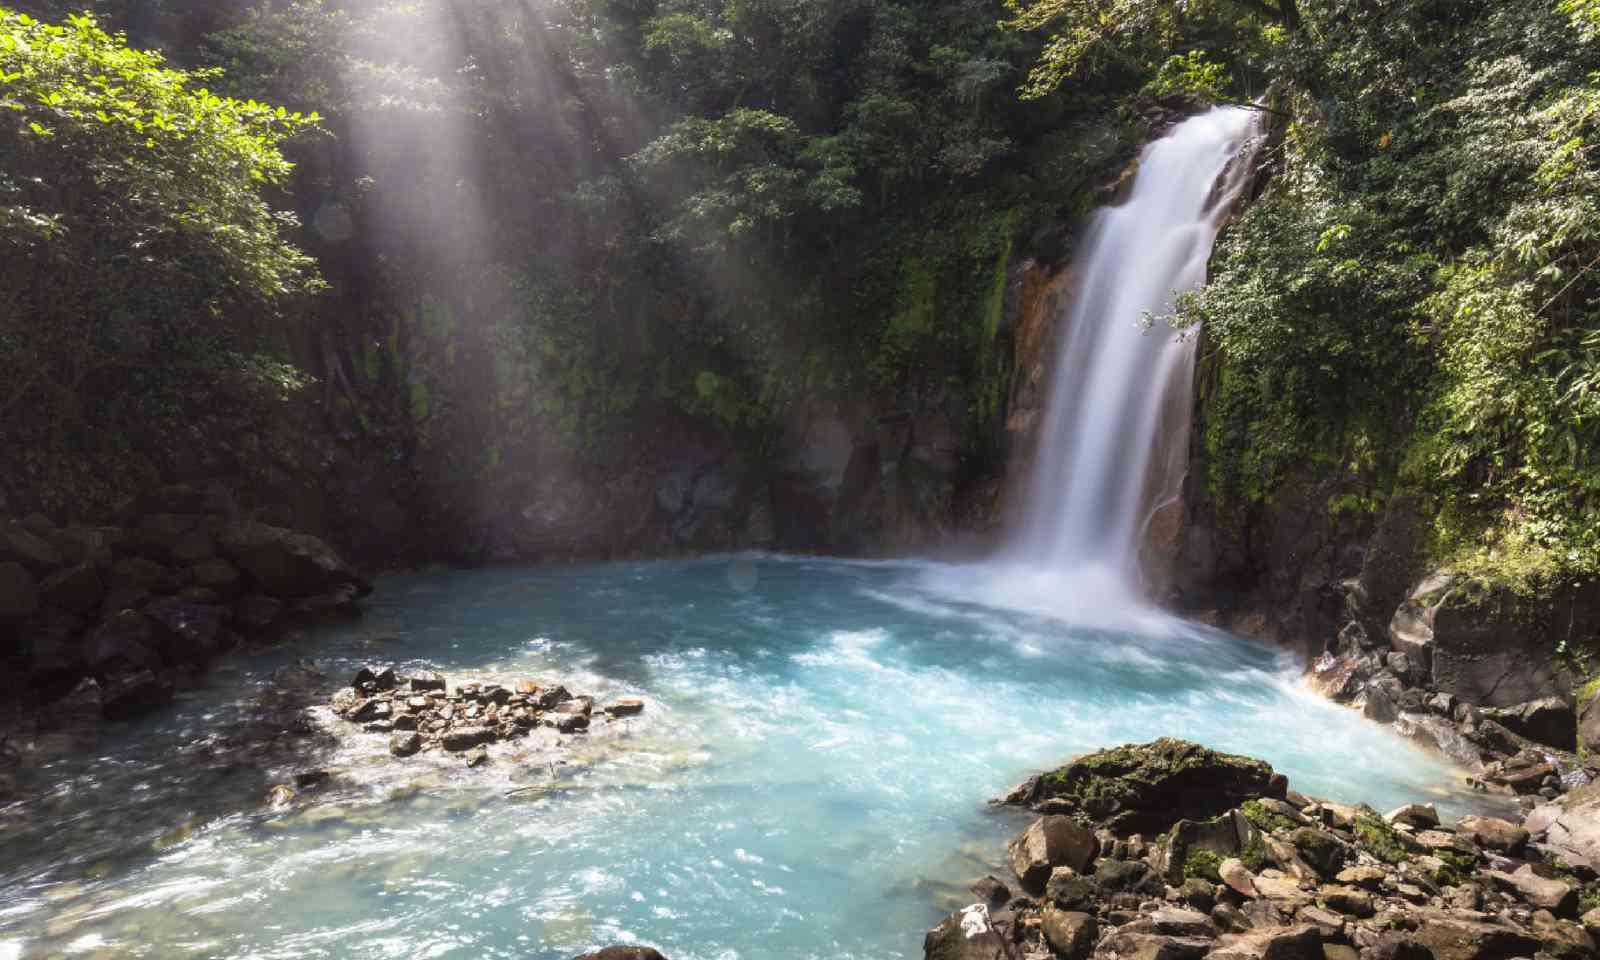 Waterfall Rio Celeste, Tenorio Volcano National Park (Shutterstock)